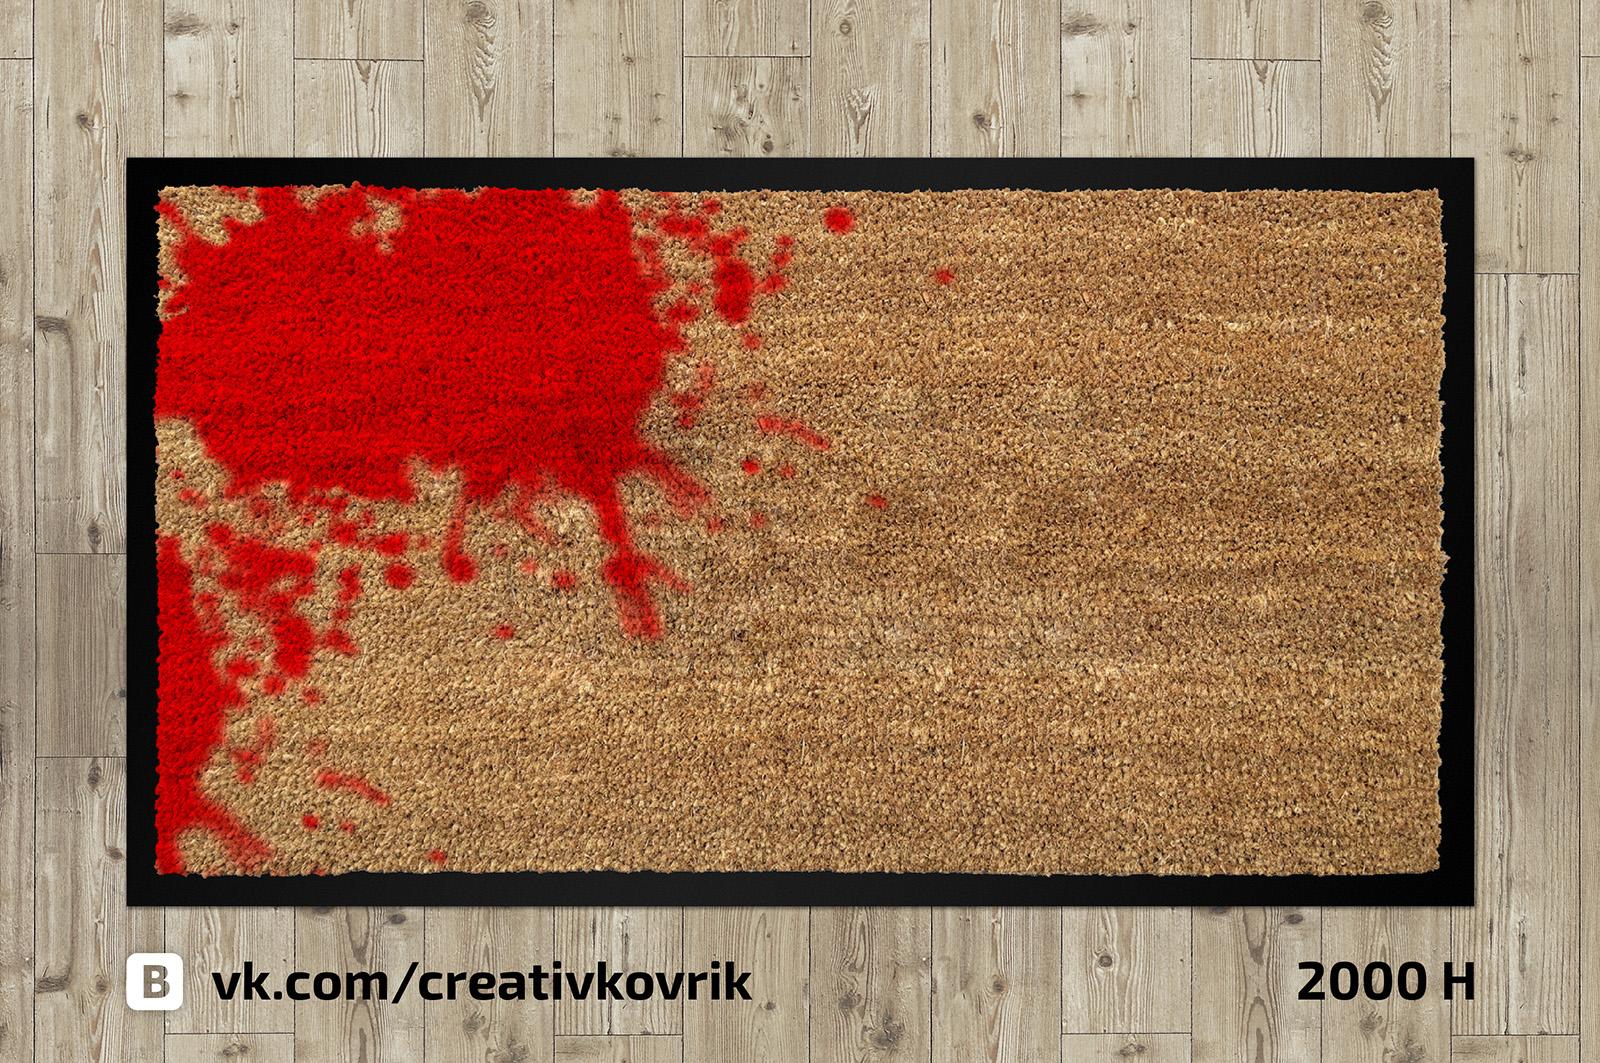 Сделать дизайн приддверного коврика фото f_36055896b5d0b0ed.jpg